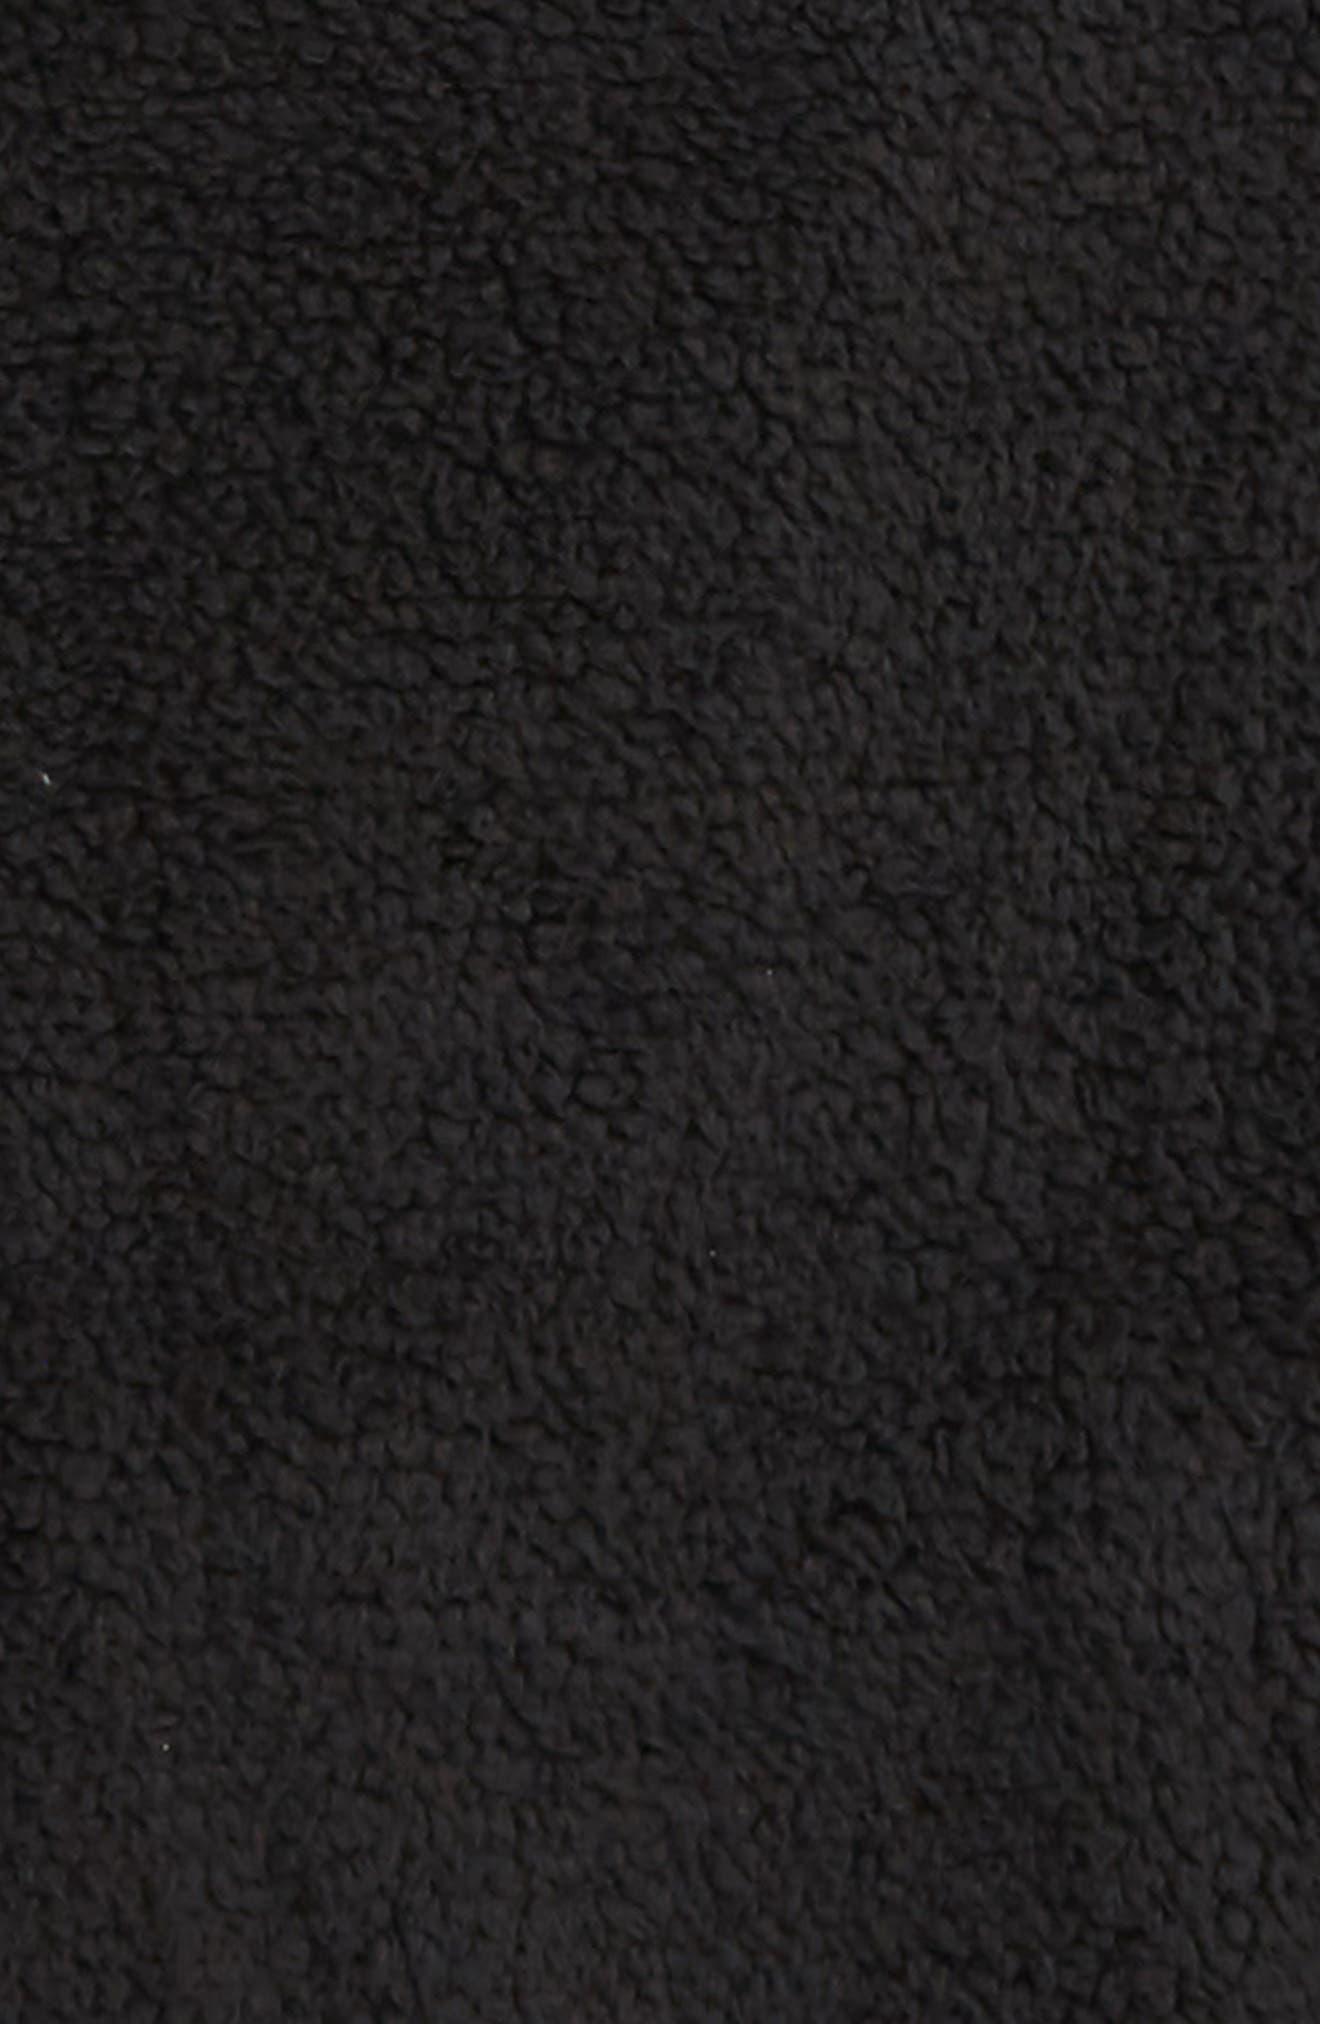 Khampfire Fleece Pullover,                             Alternate thumbnail 2, color,                             001